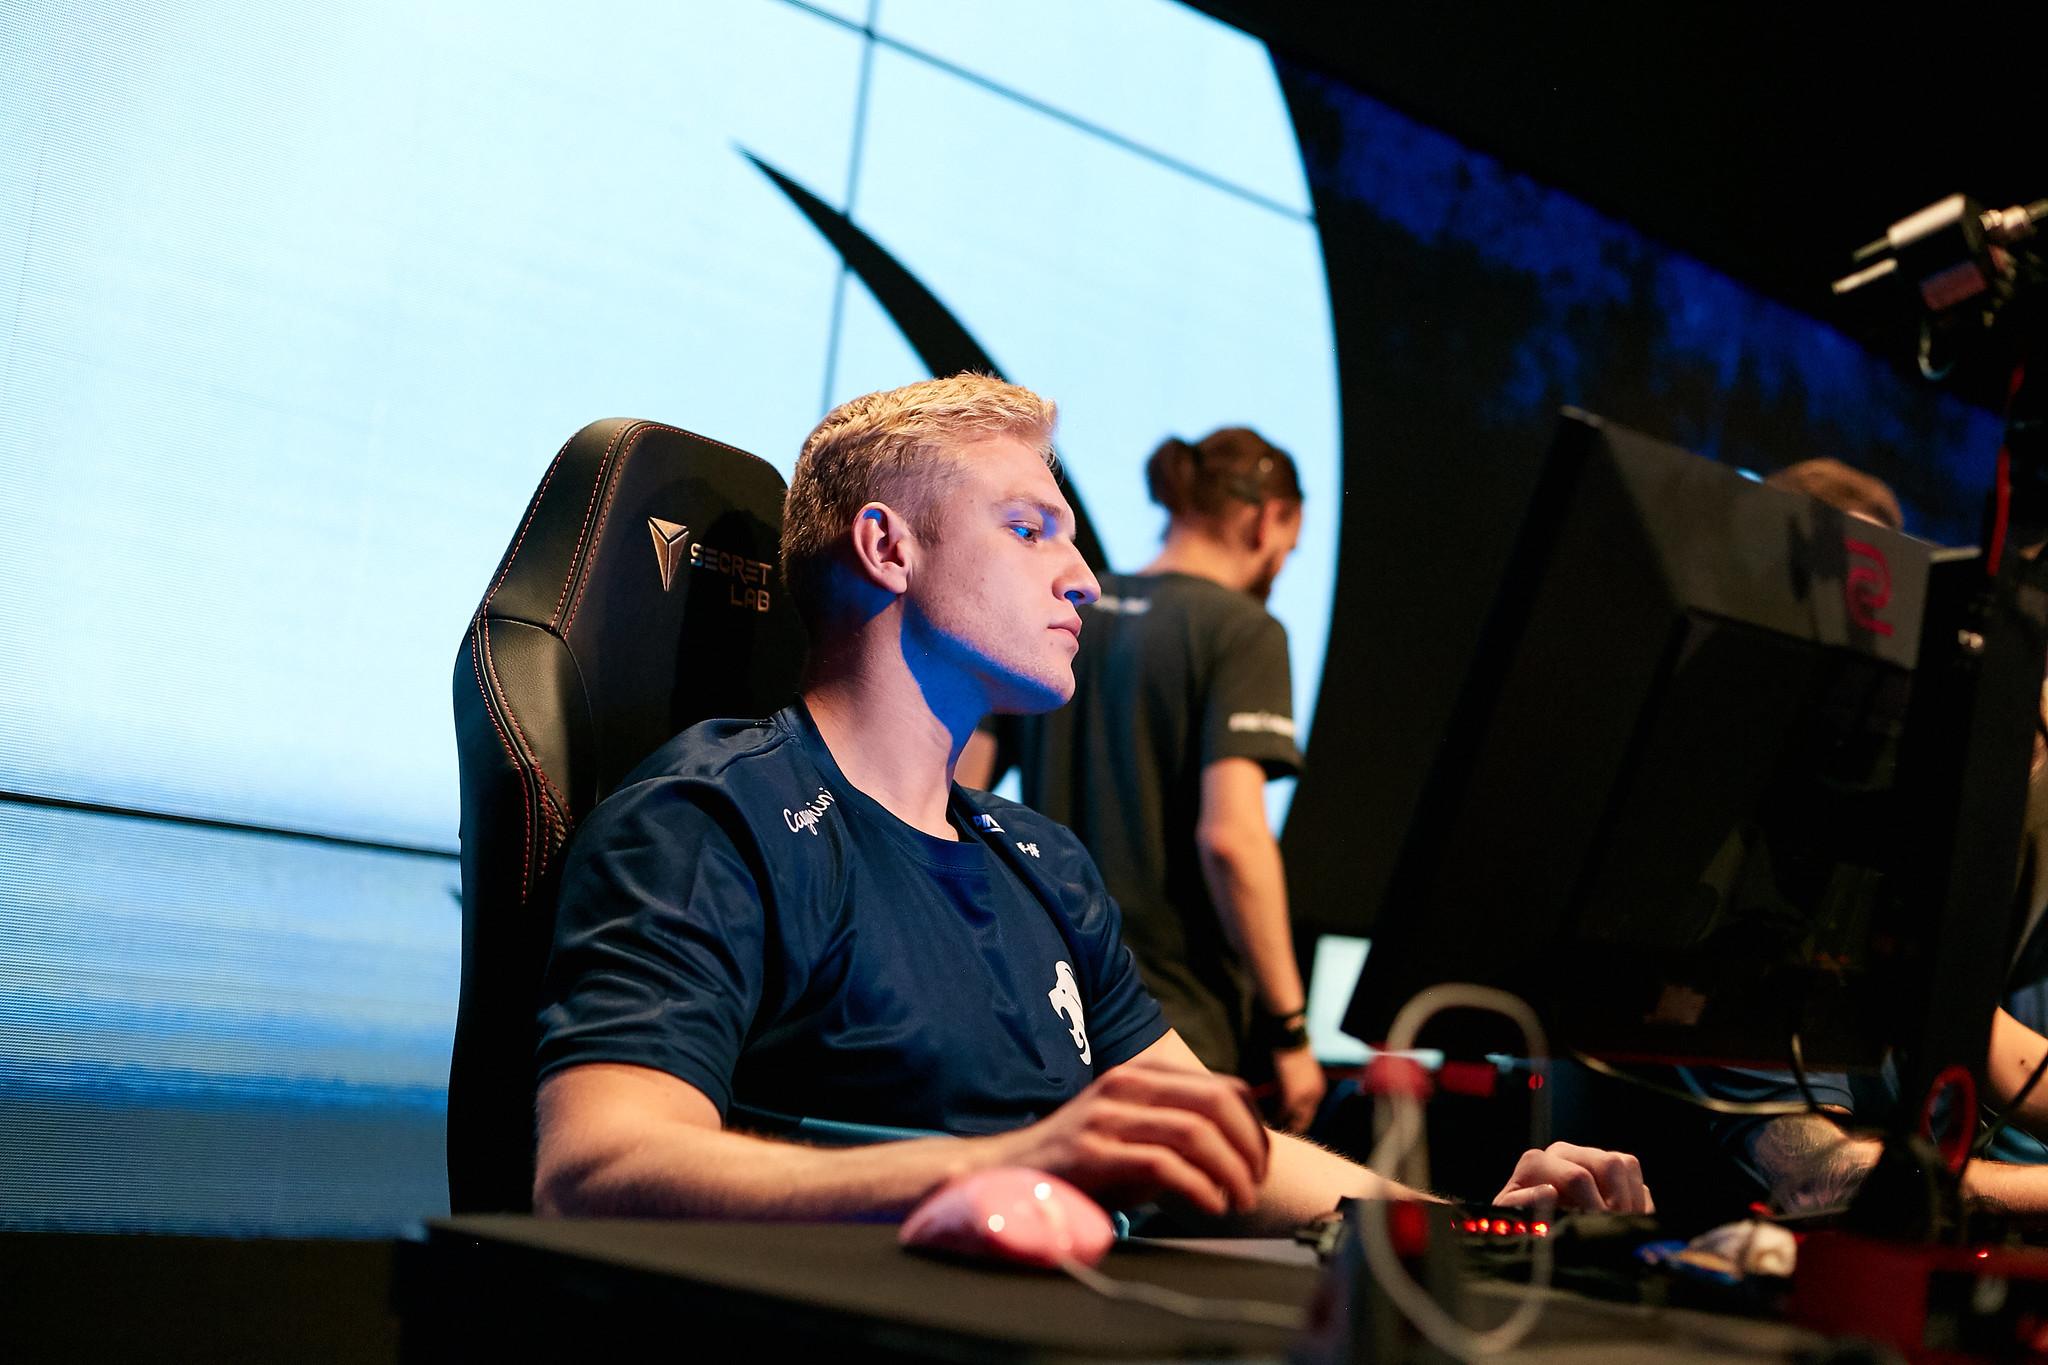 North и mousesports — финалисты верхней сетки на Europe Minor